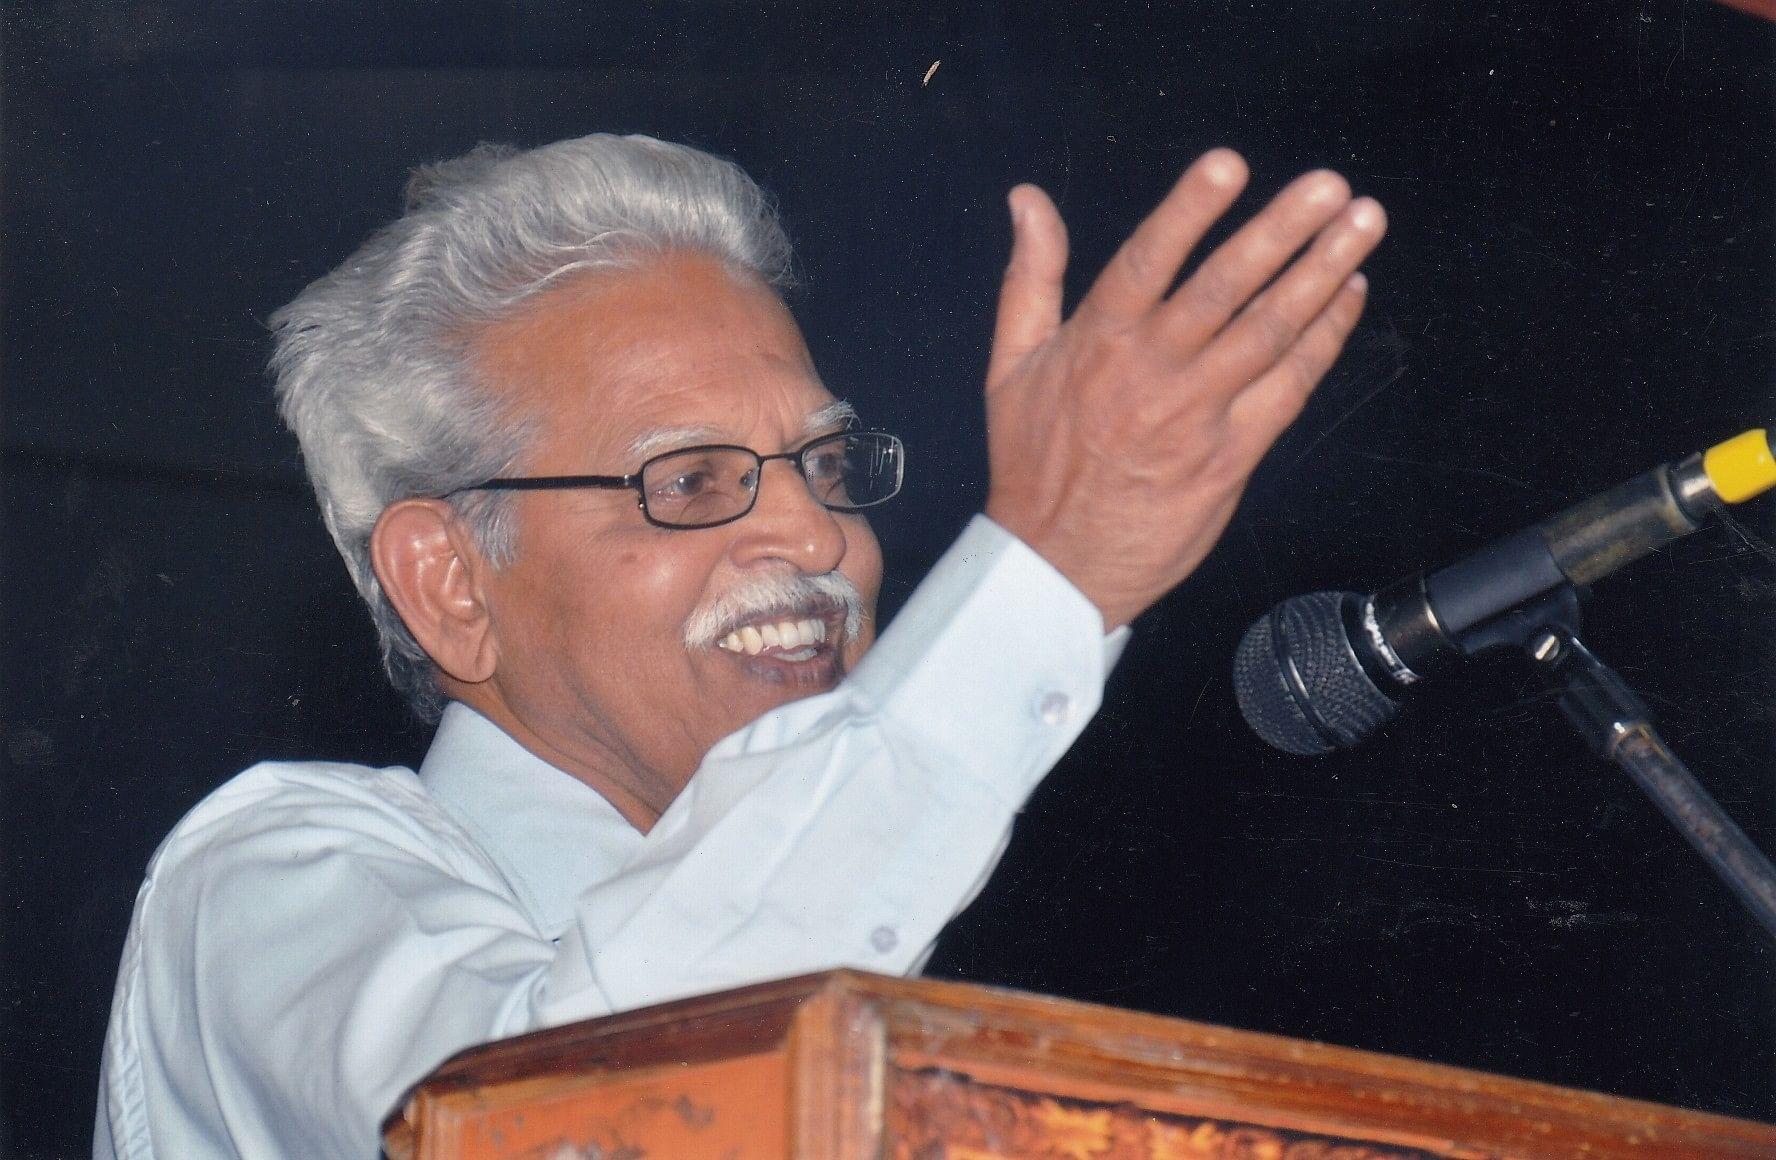 File photo of Varavara Rao at a public event. (Photograph courtesy: N Venugopal)